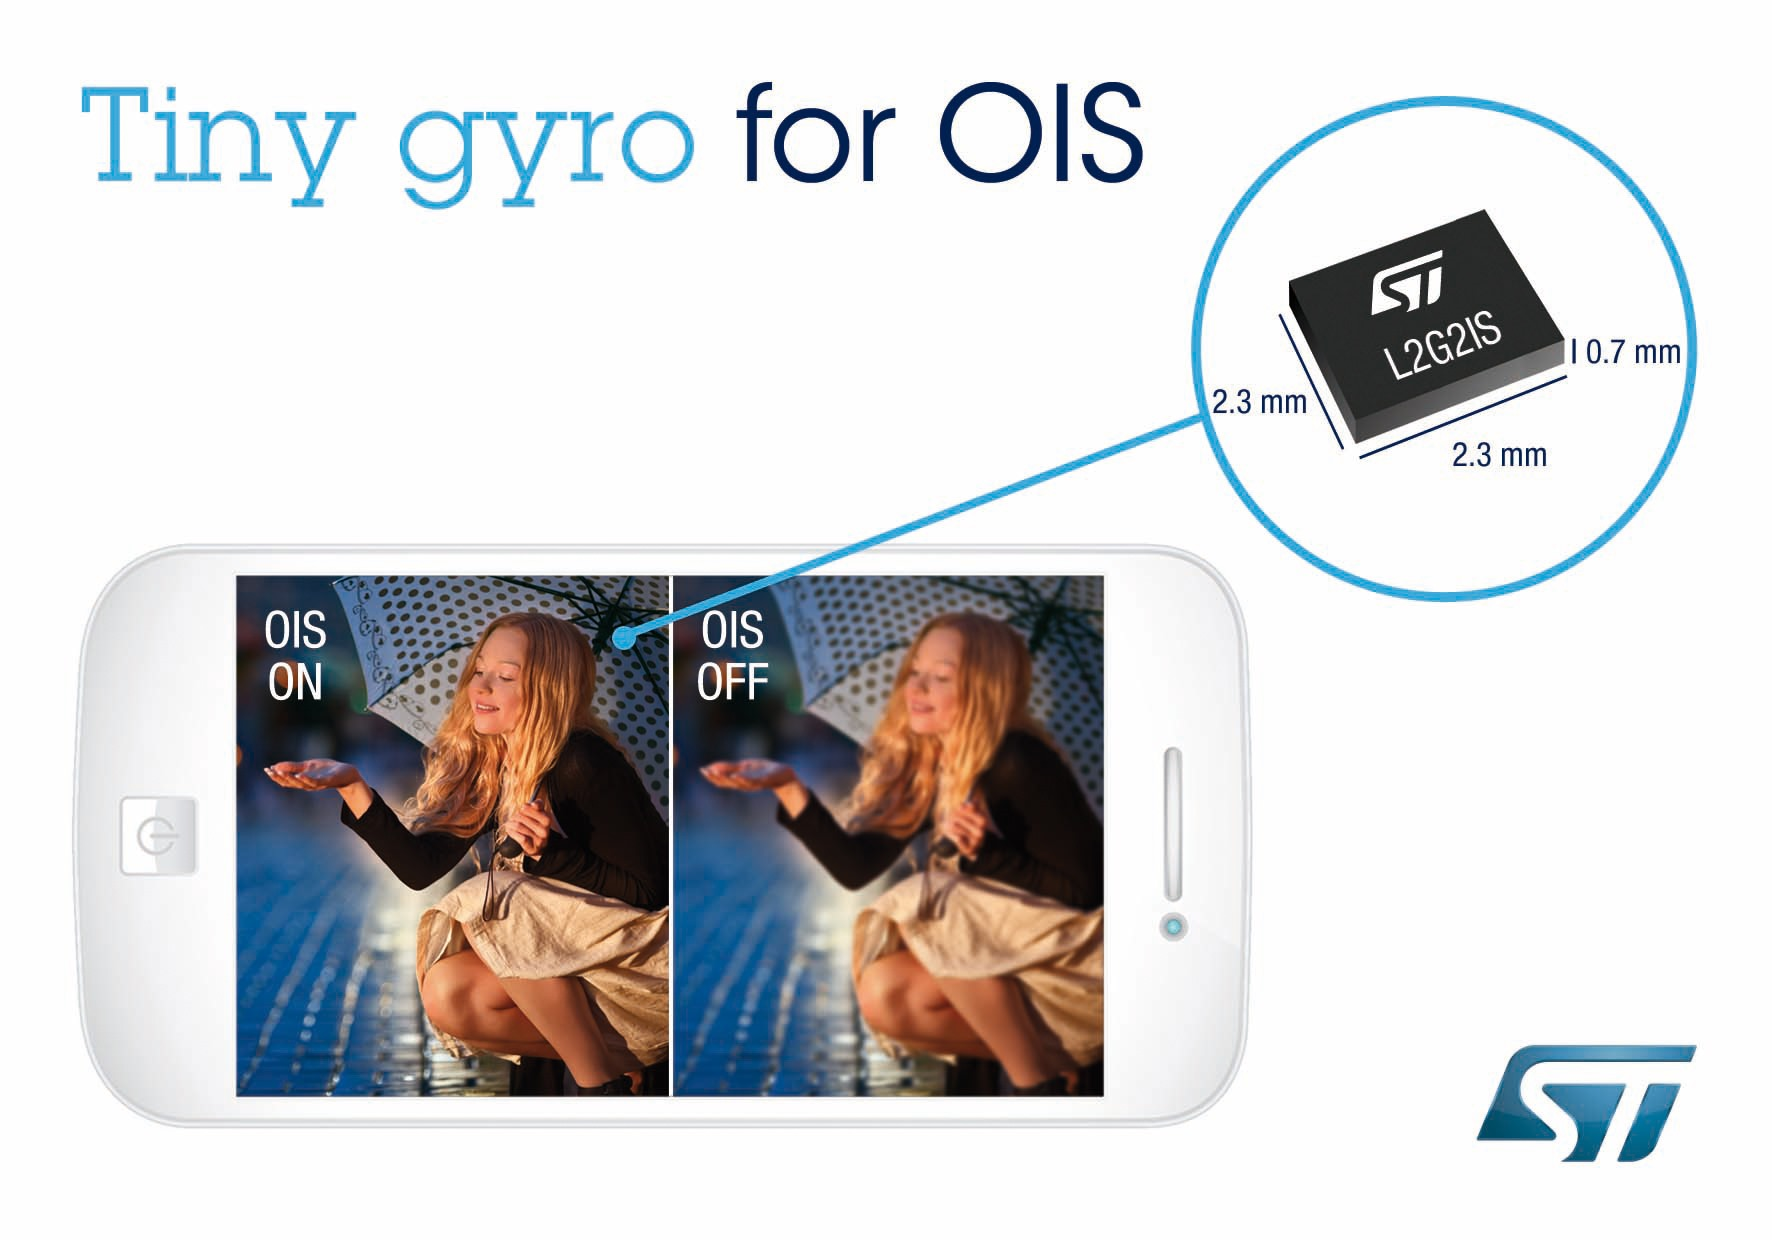 L2G2IS OIS Gyro